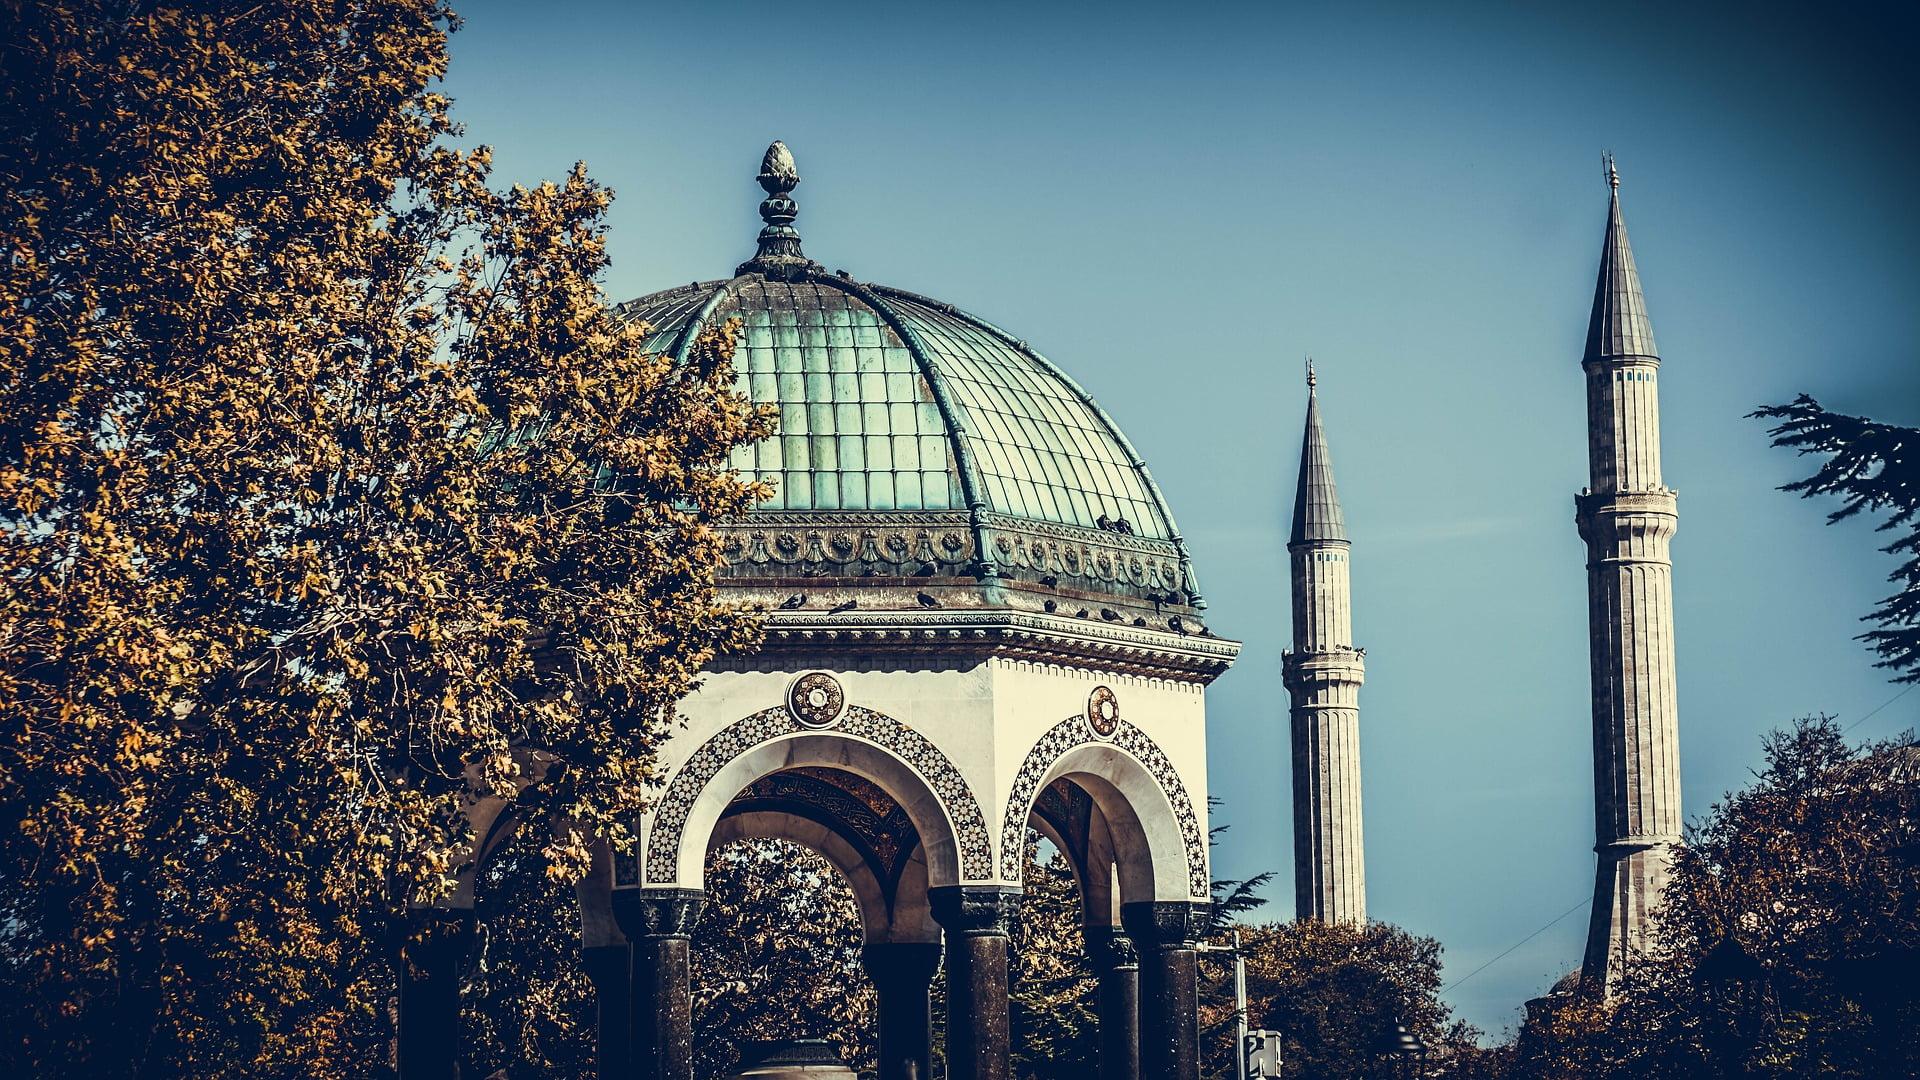 Mosque in Istanbul, Turkey - photo by Maria Saveleva from Pixabay under Pixabay License